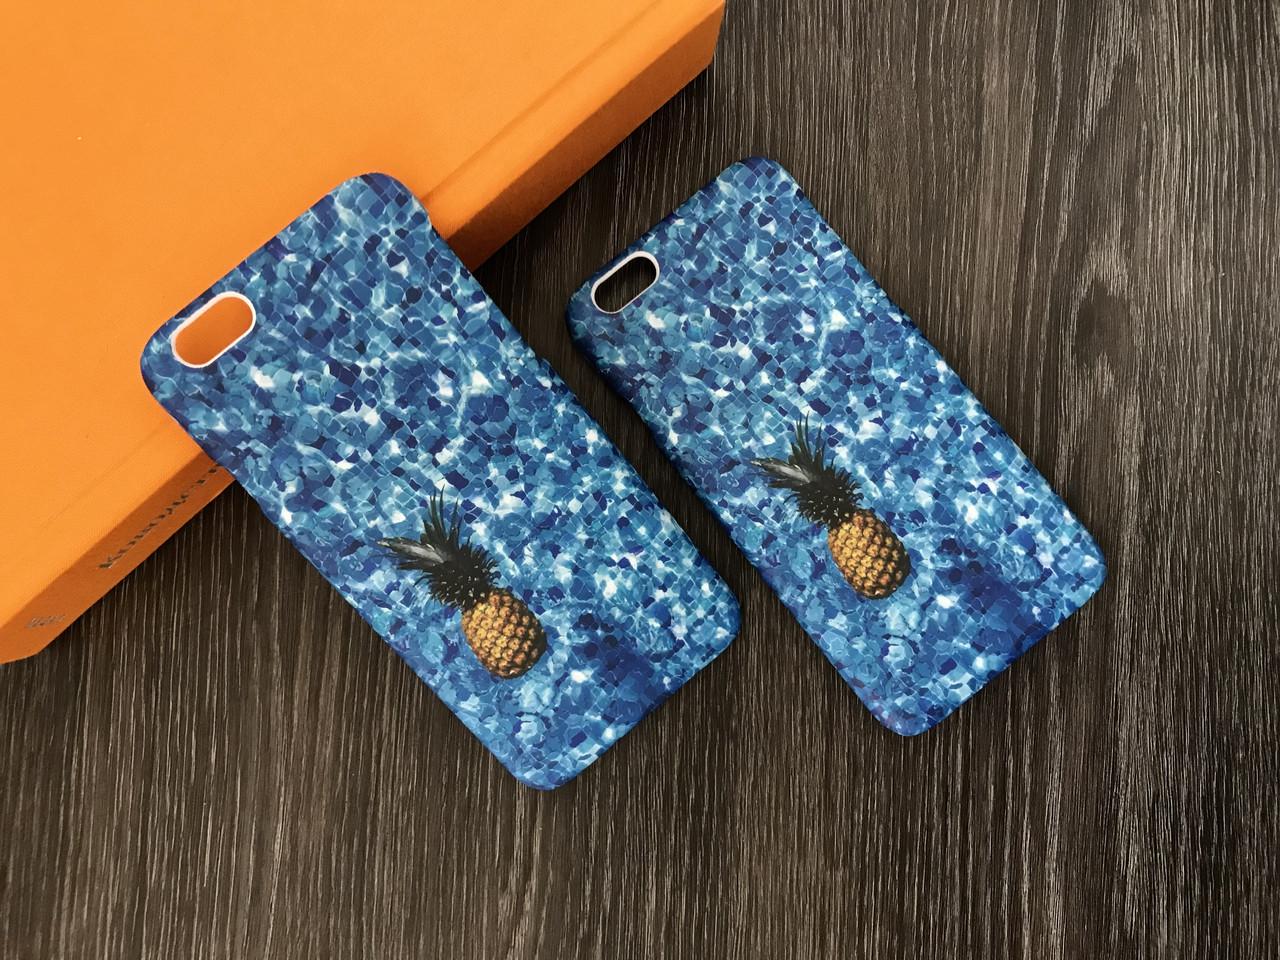 Плаcтиковый чехол  iPhone 6 Plus ананас синий